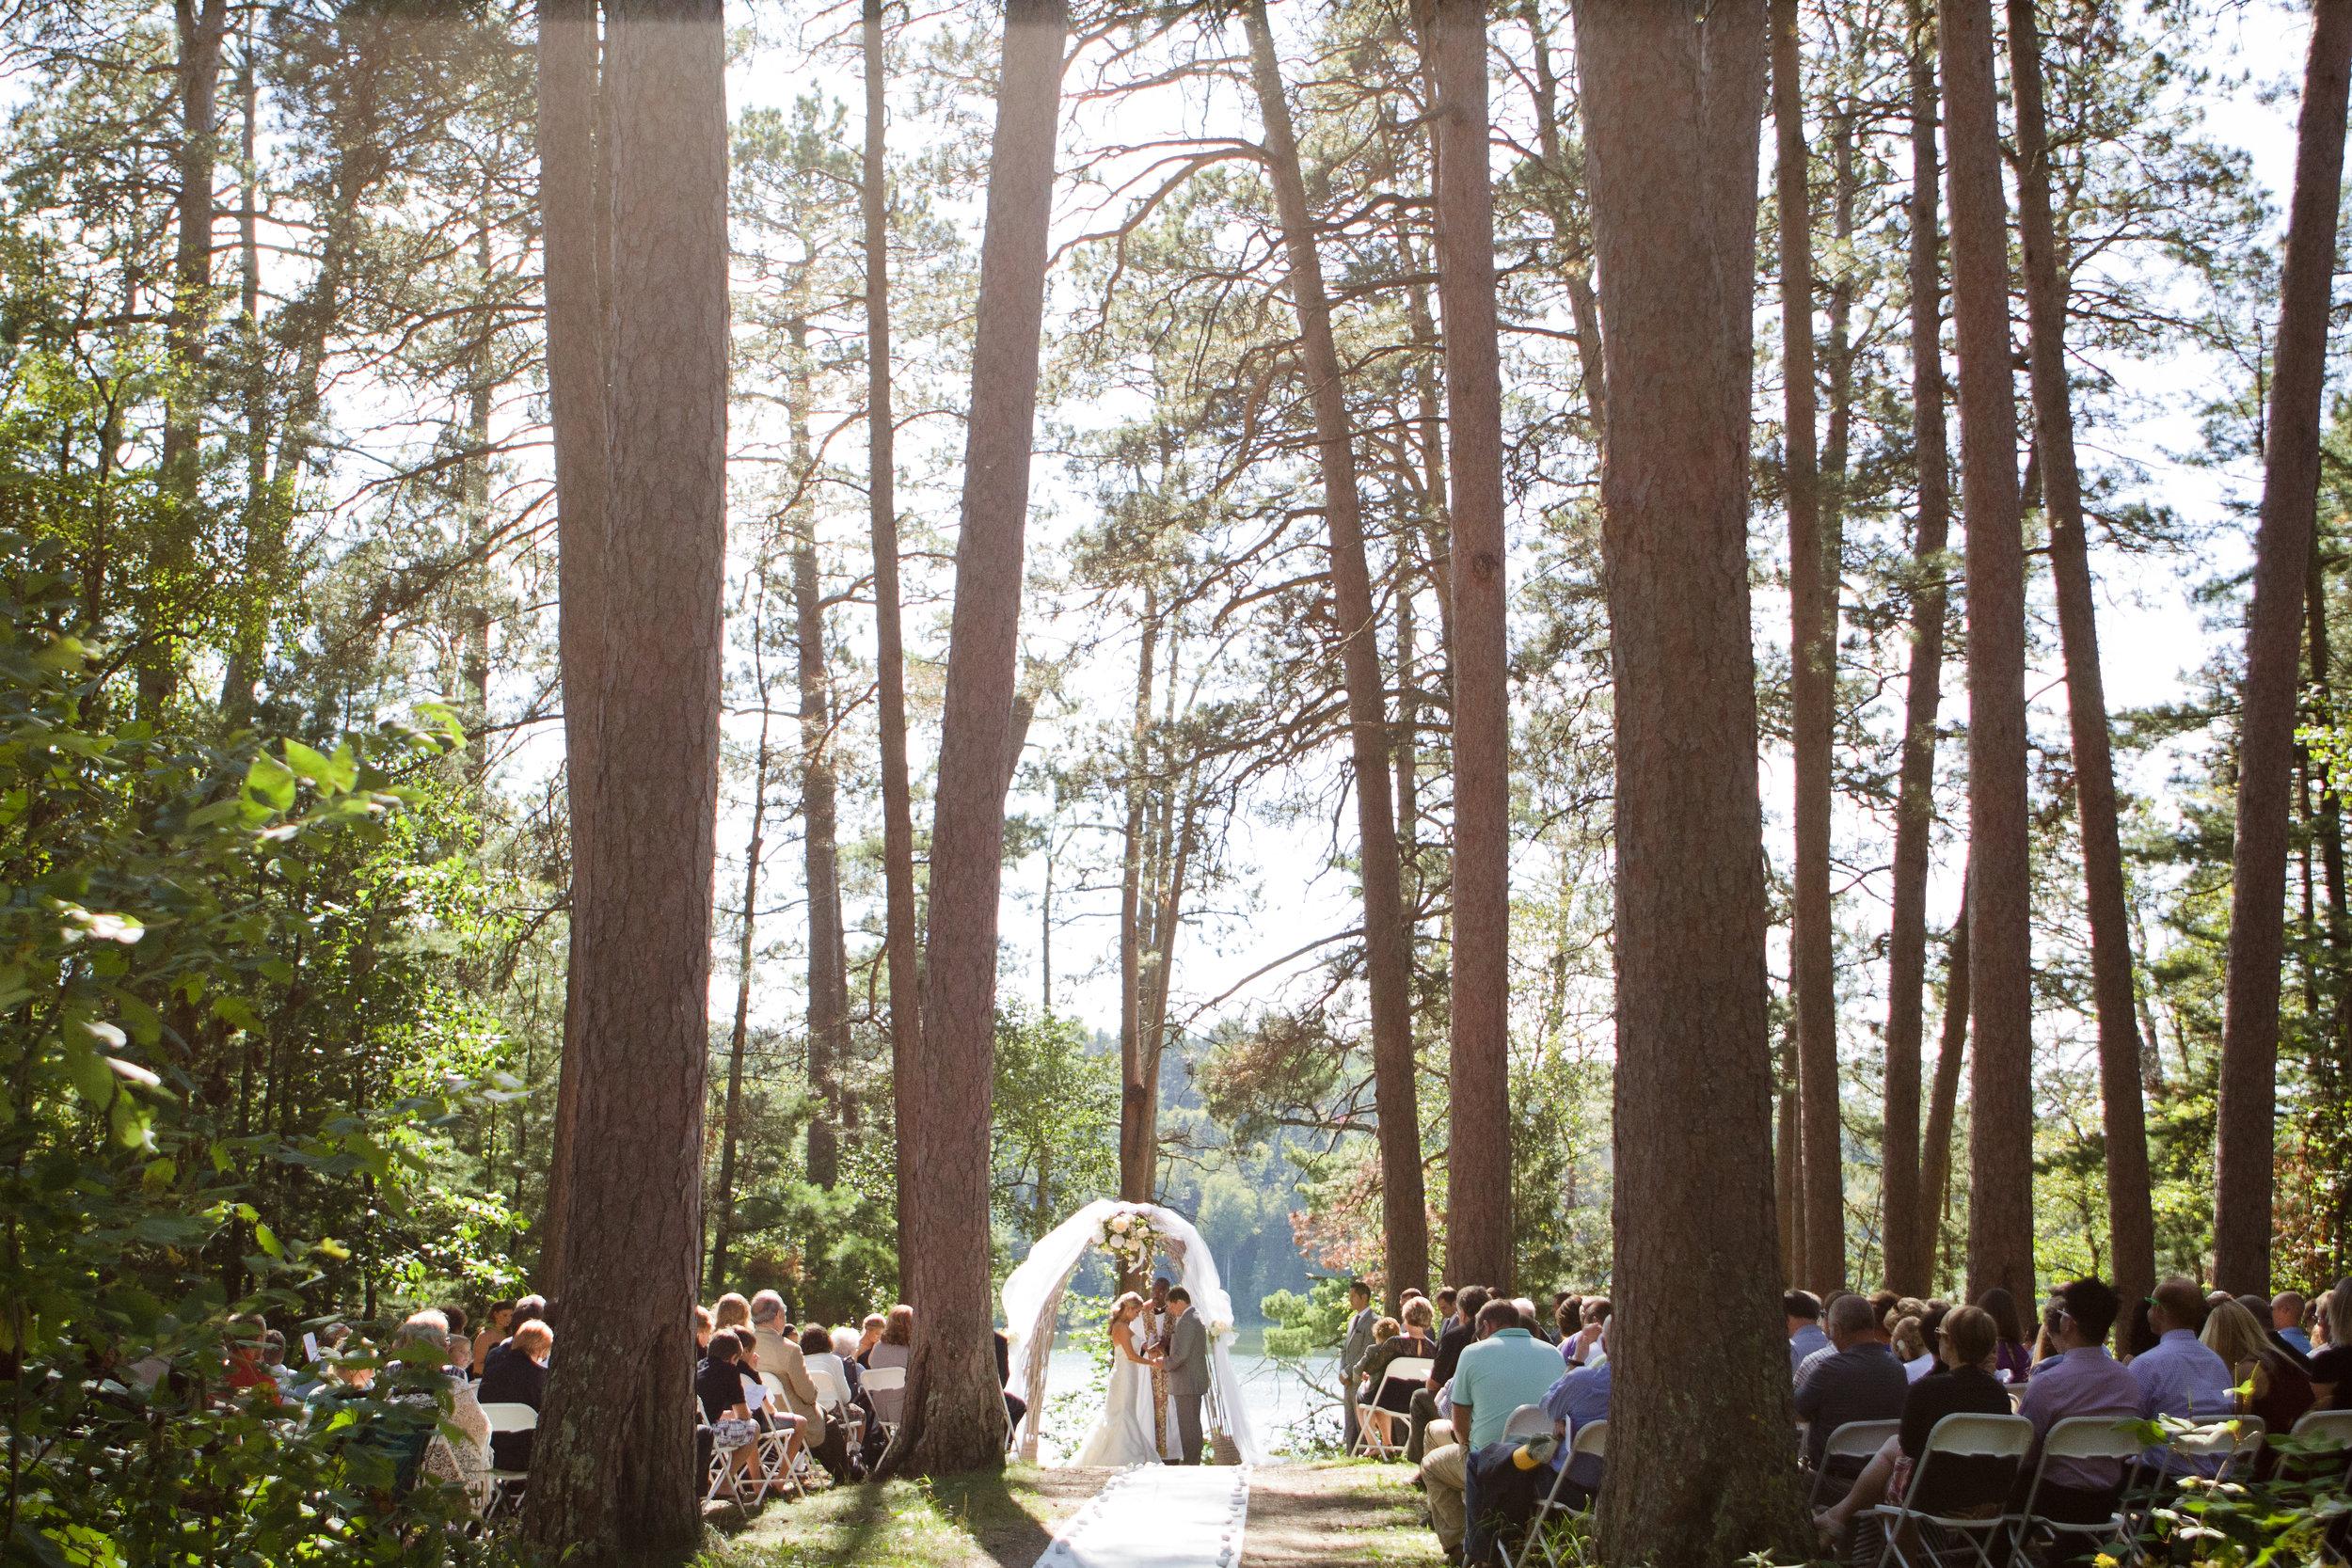 Ceremony site in Itasca State Park, Minnesota.